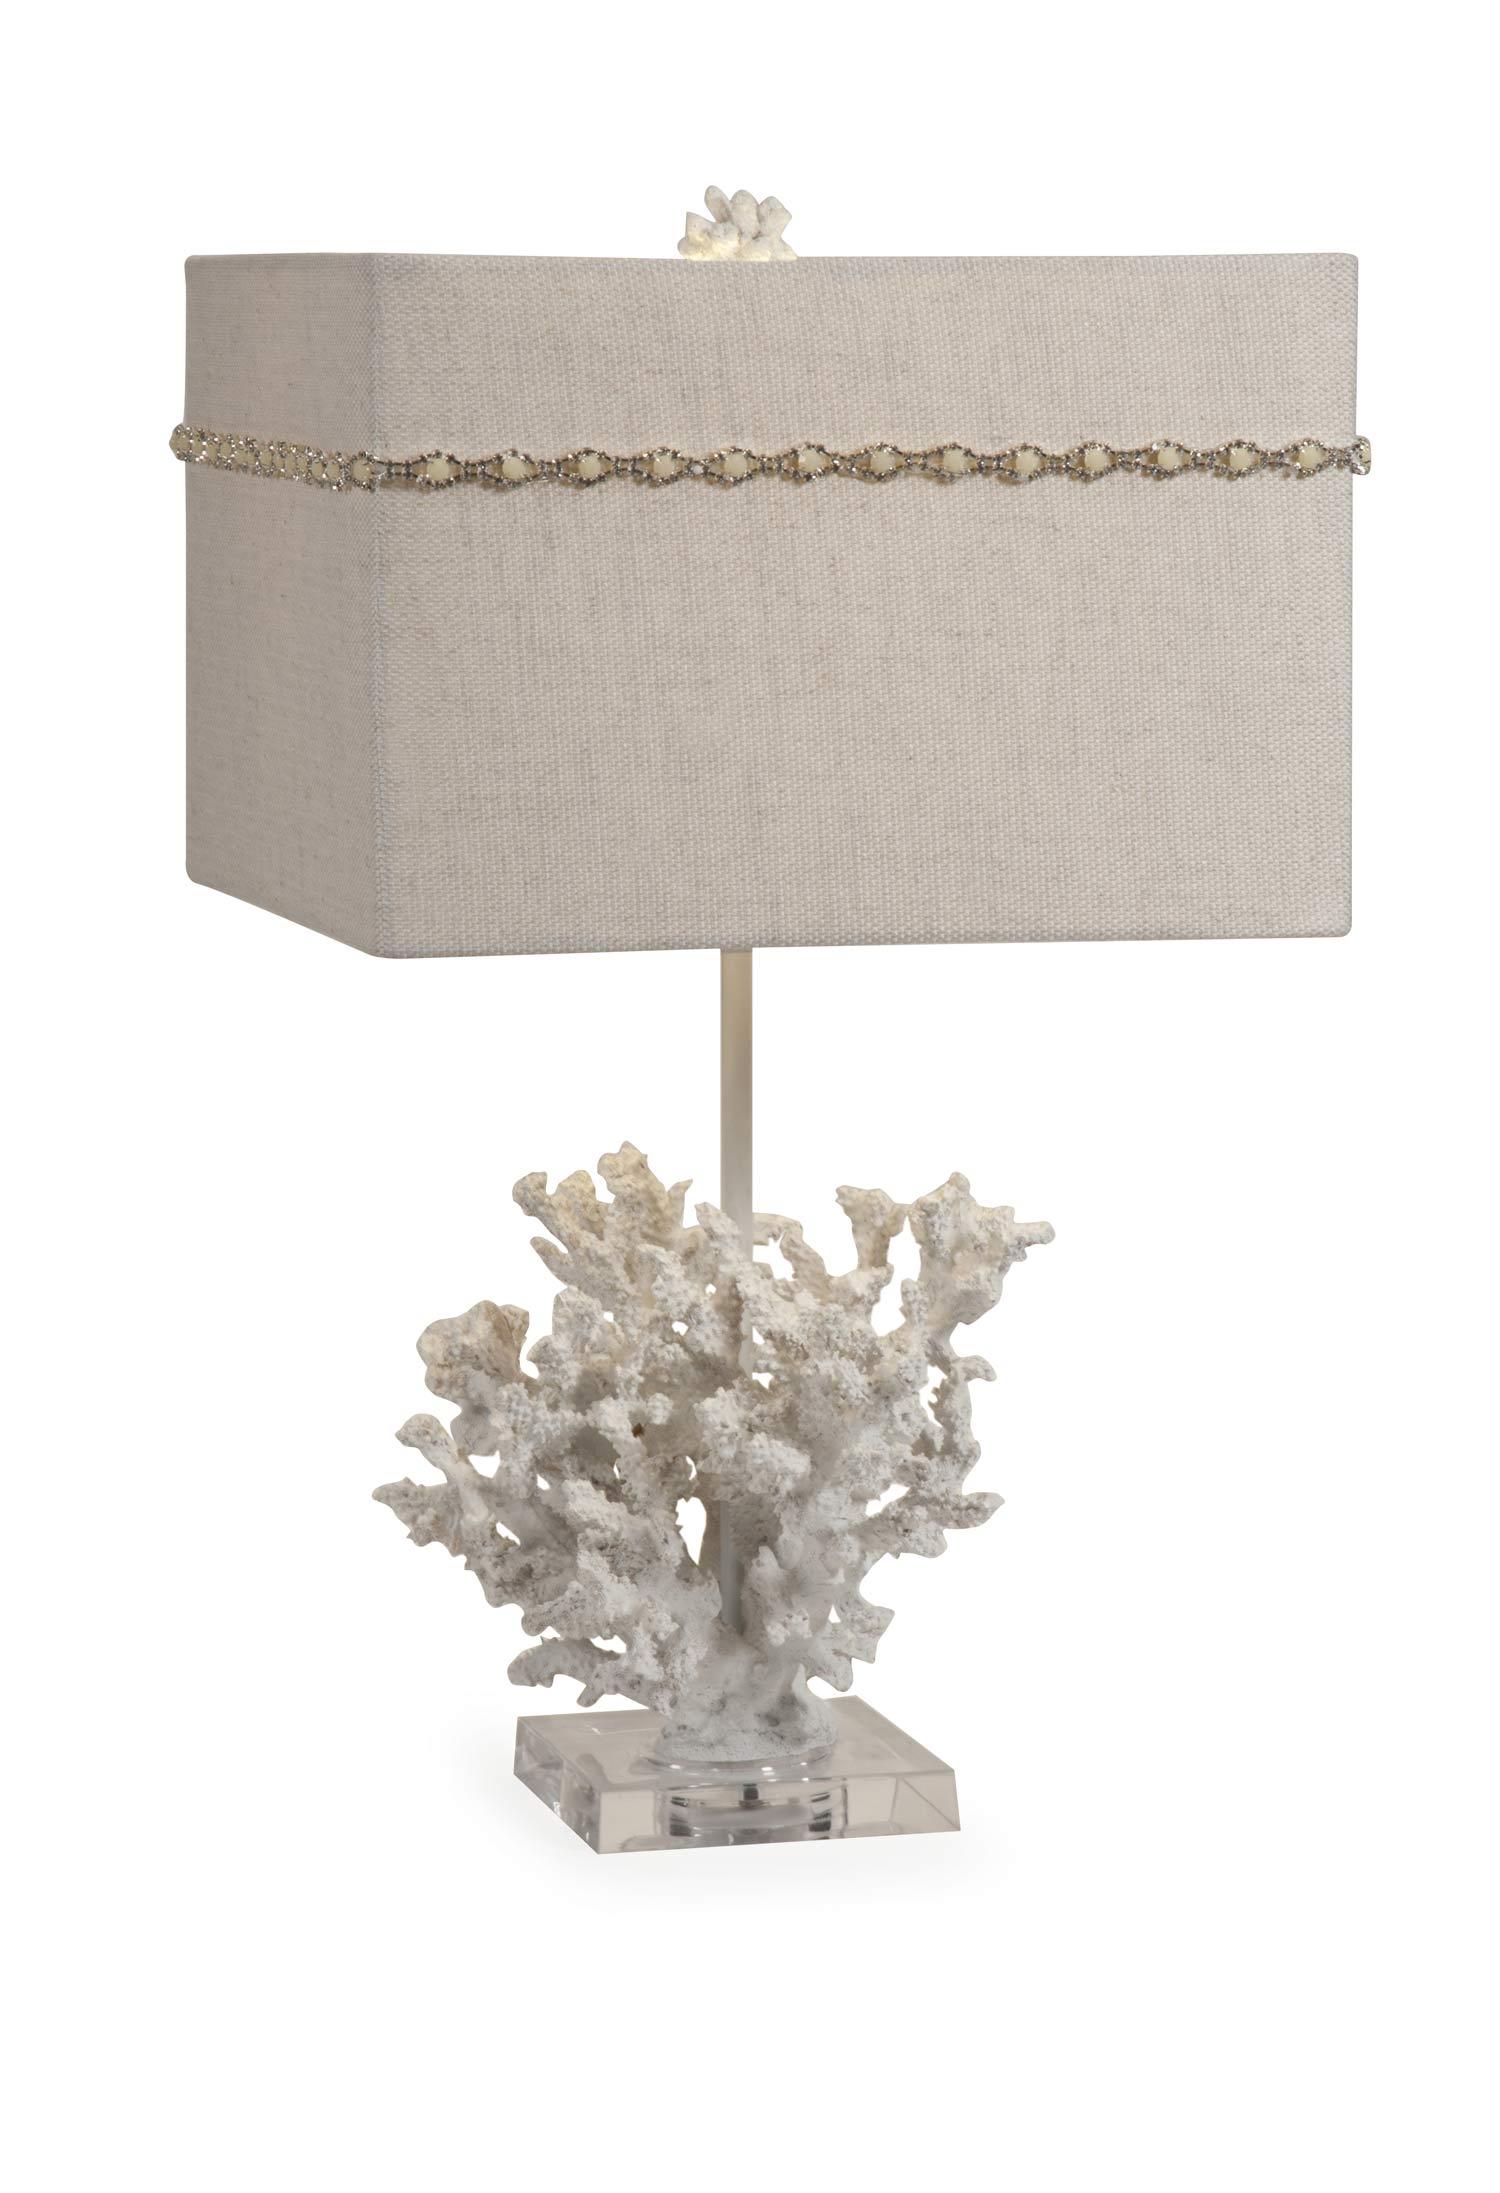 IMAX Bonavista Coral Lamp